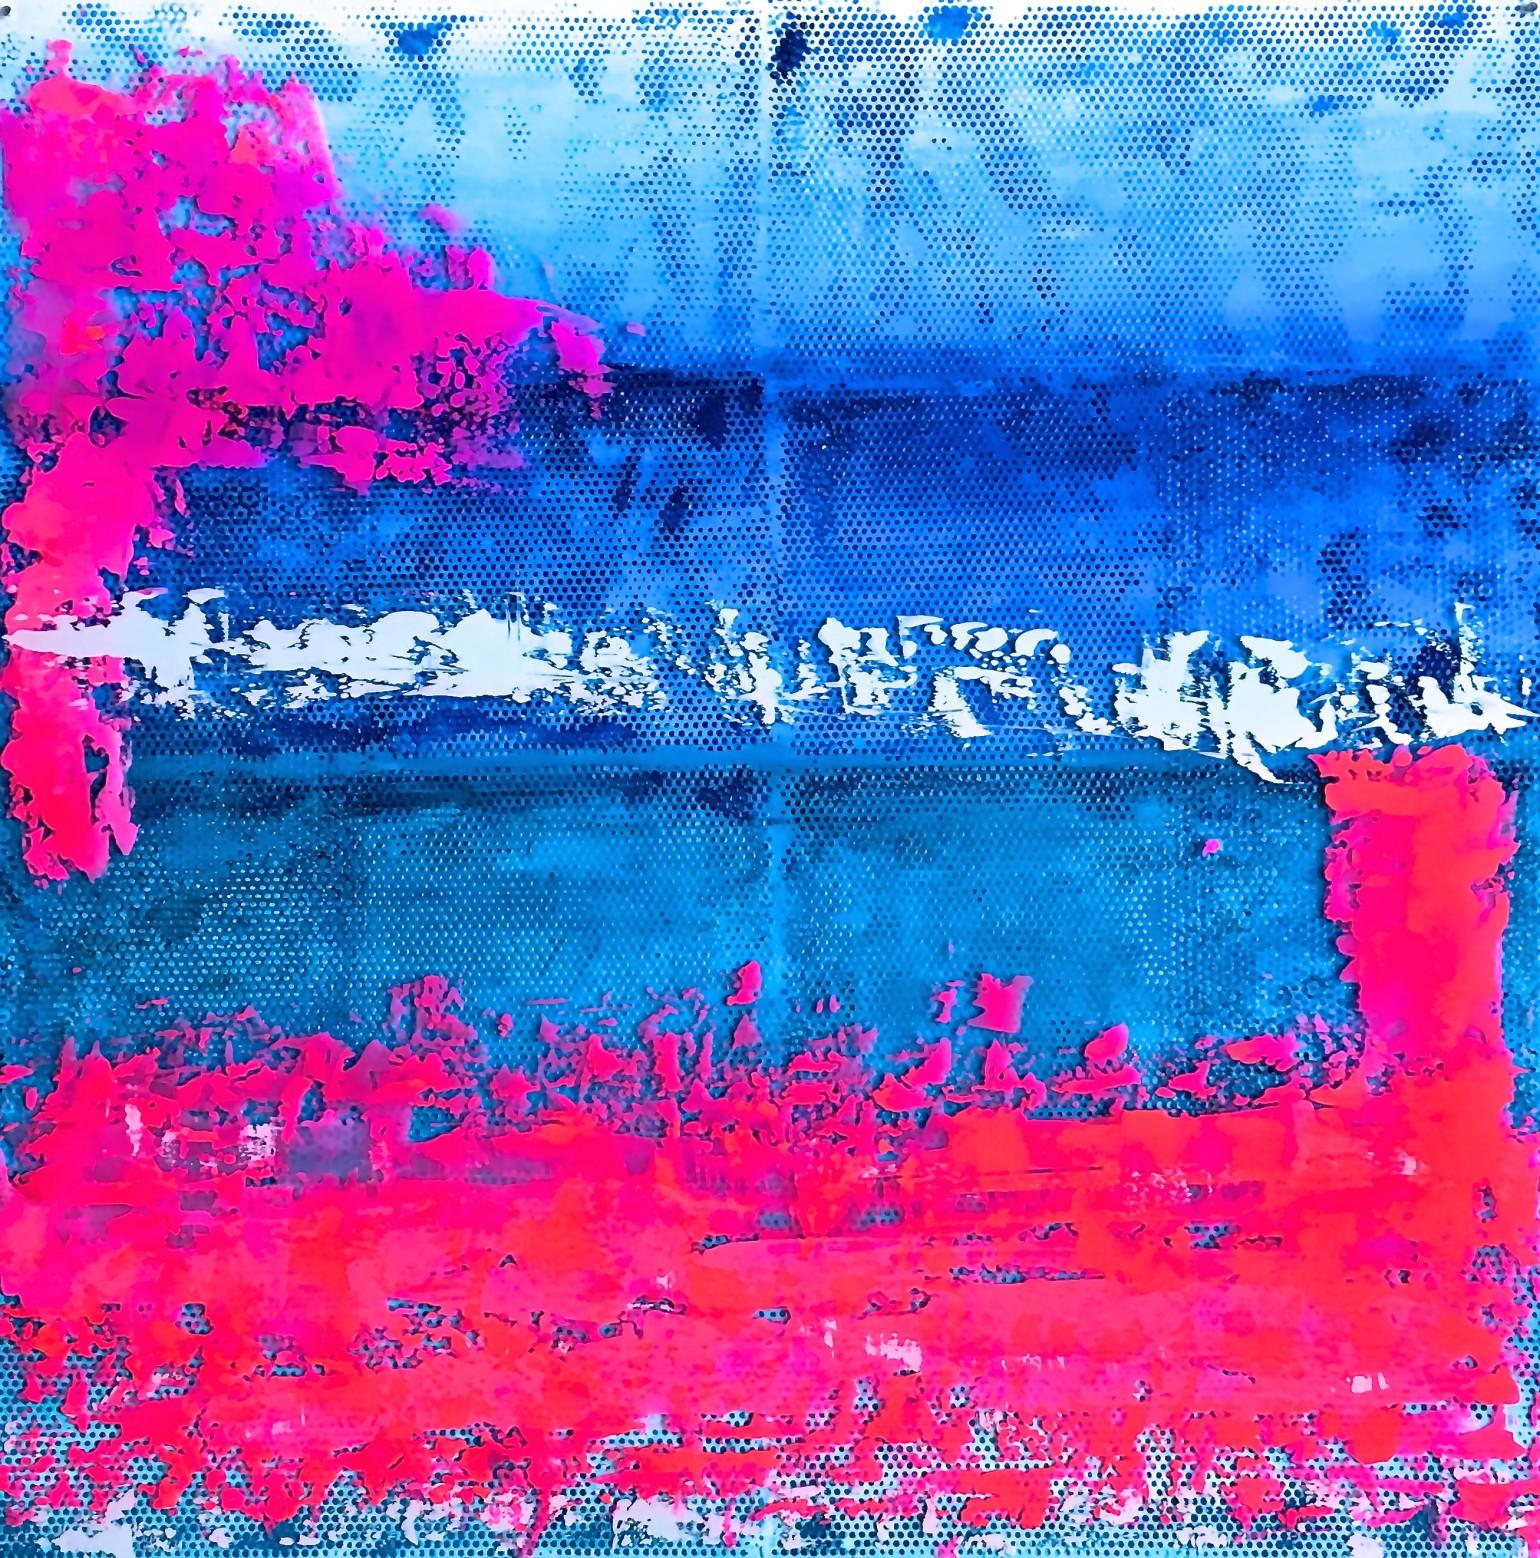 Blaues Wasser PINK 2 90 grad links